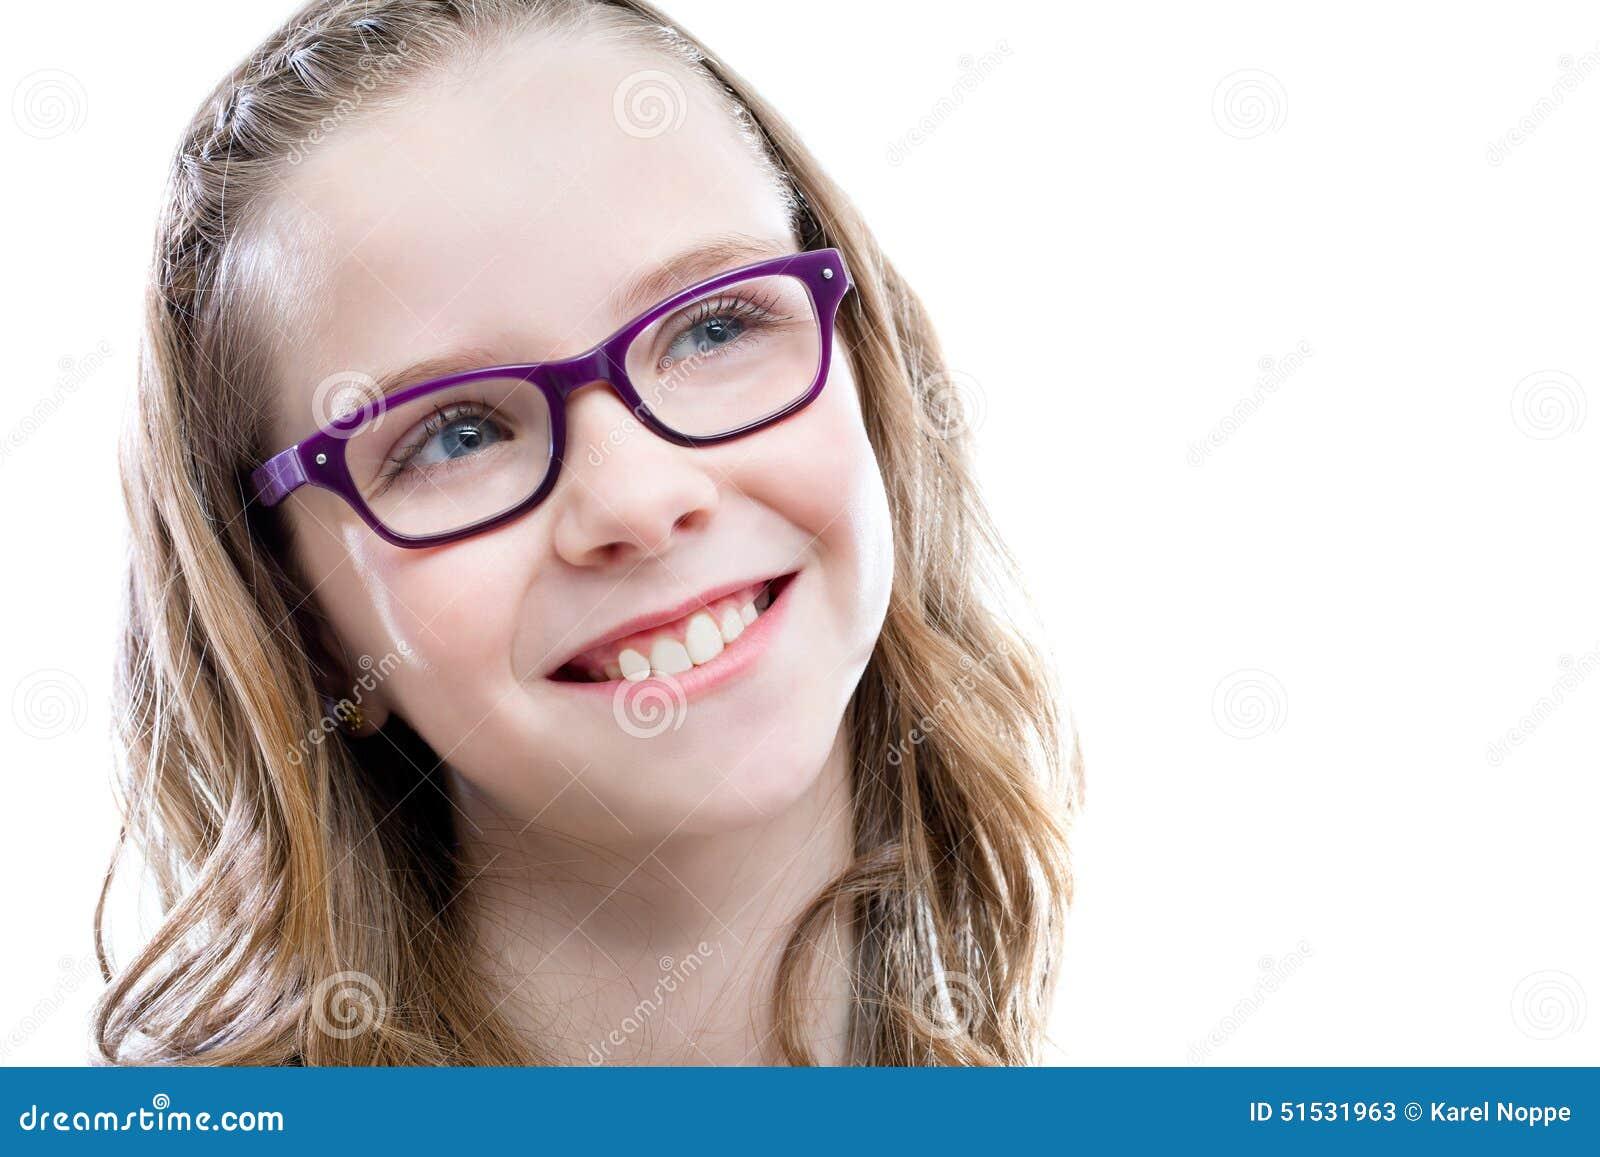 87f134b9cf5b Cute Girl With Glasses Looking At Upper Corner. Stock Image - Image ...